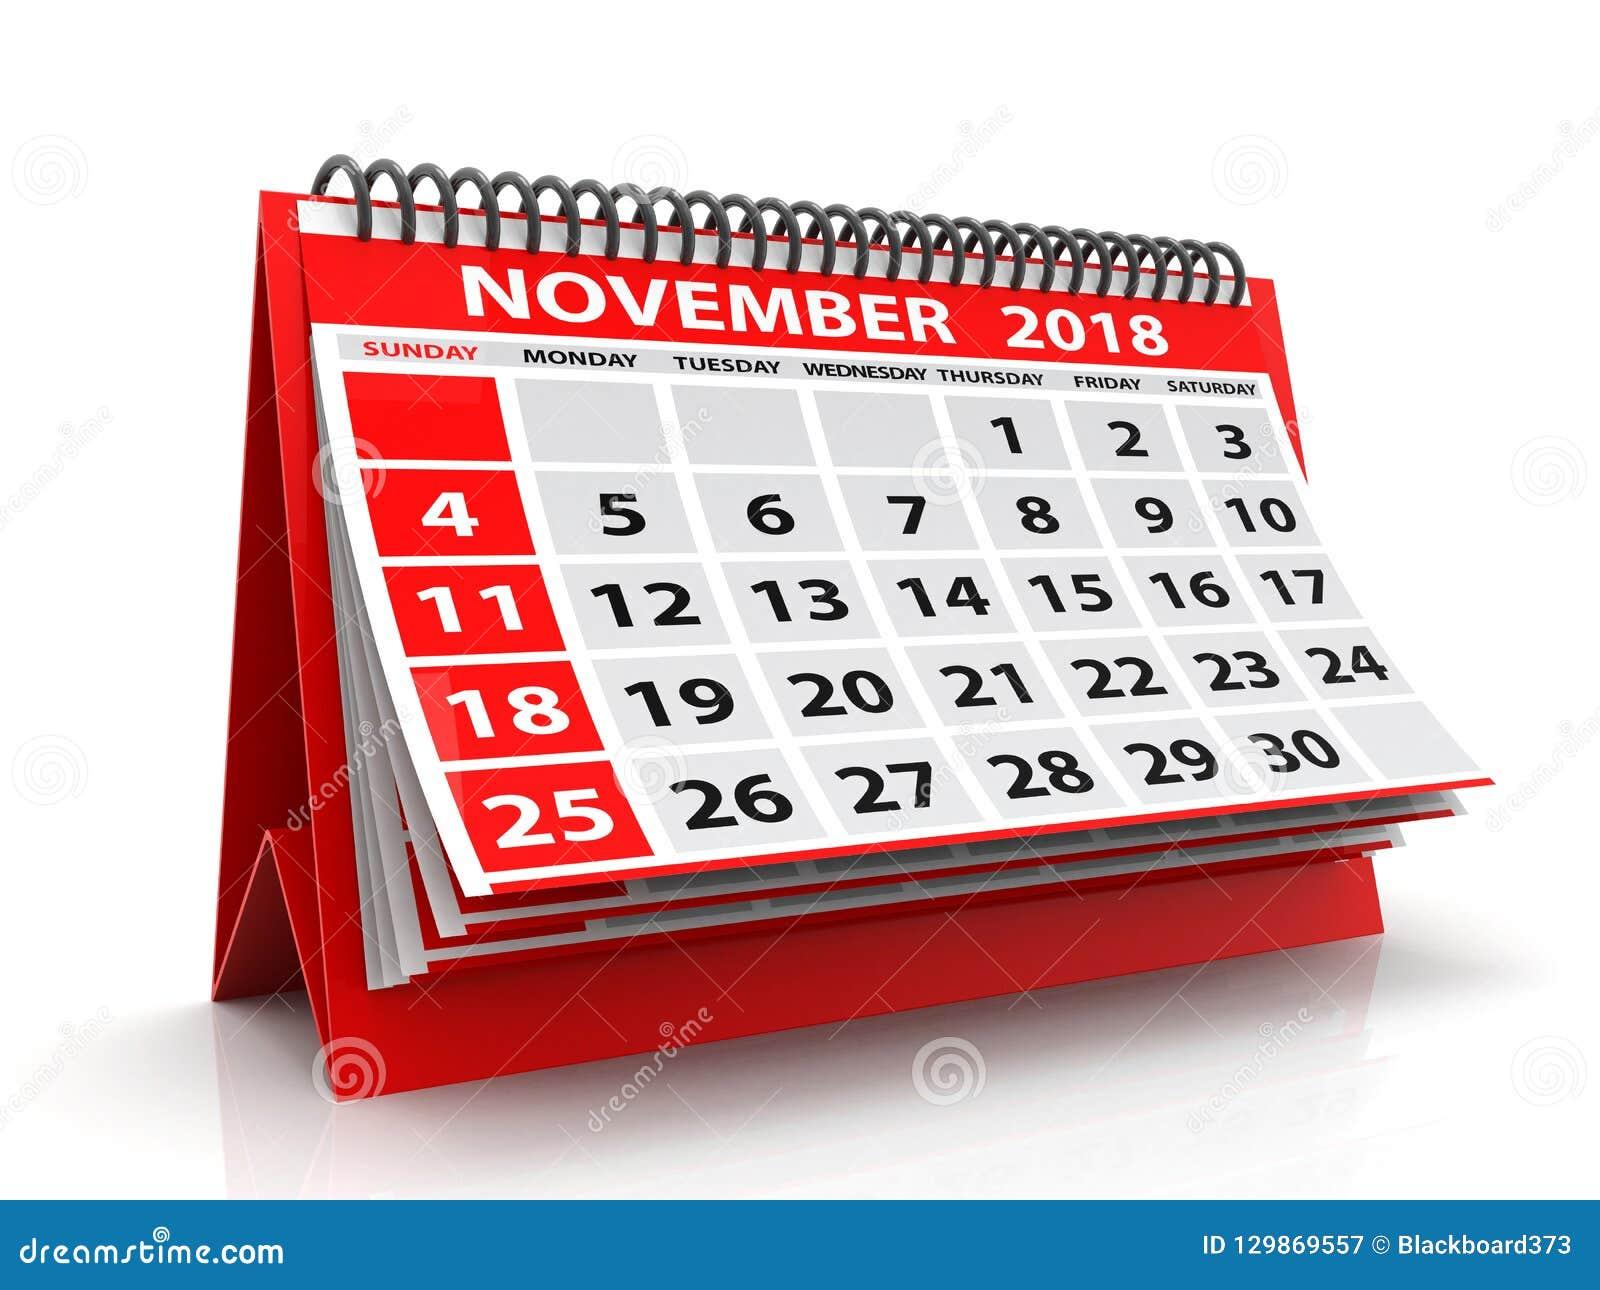 Spiral kalender November 2018 November 2018 kalender i vit bakgrund illustration 3d